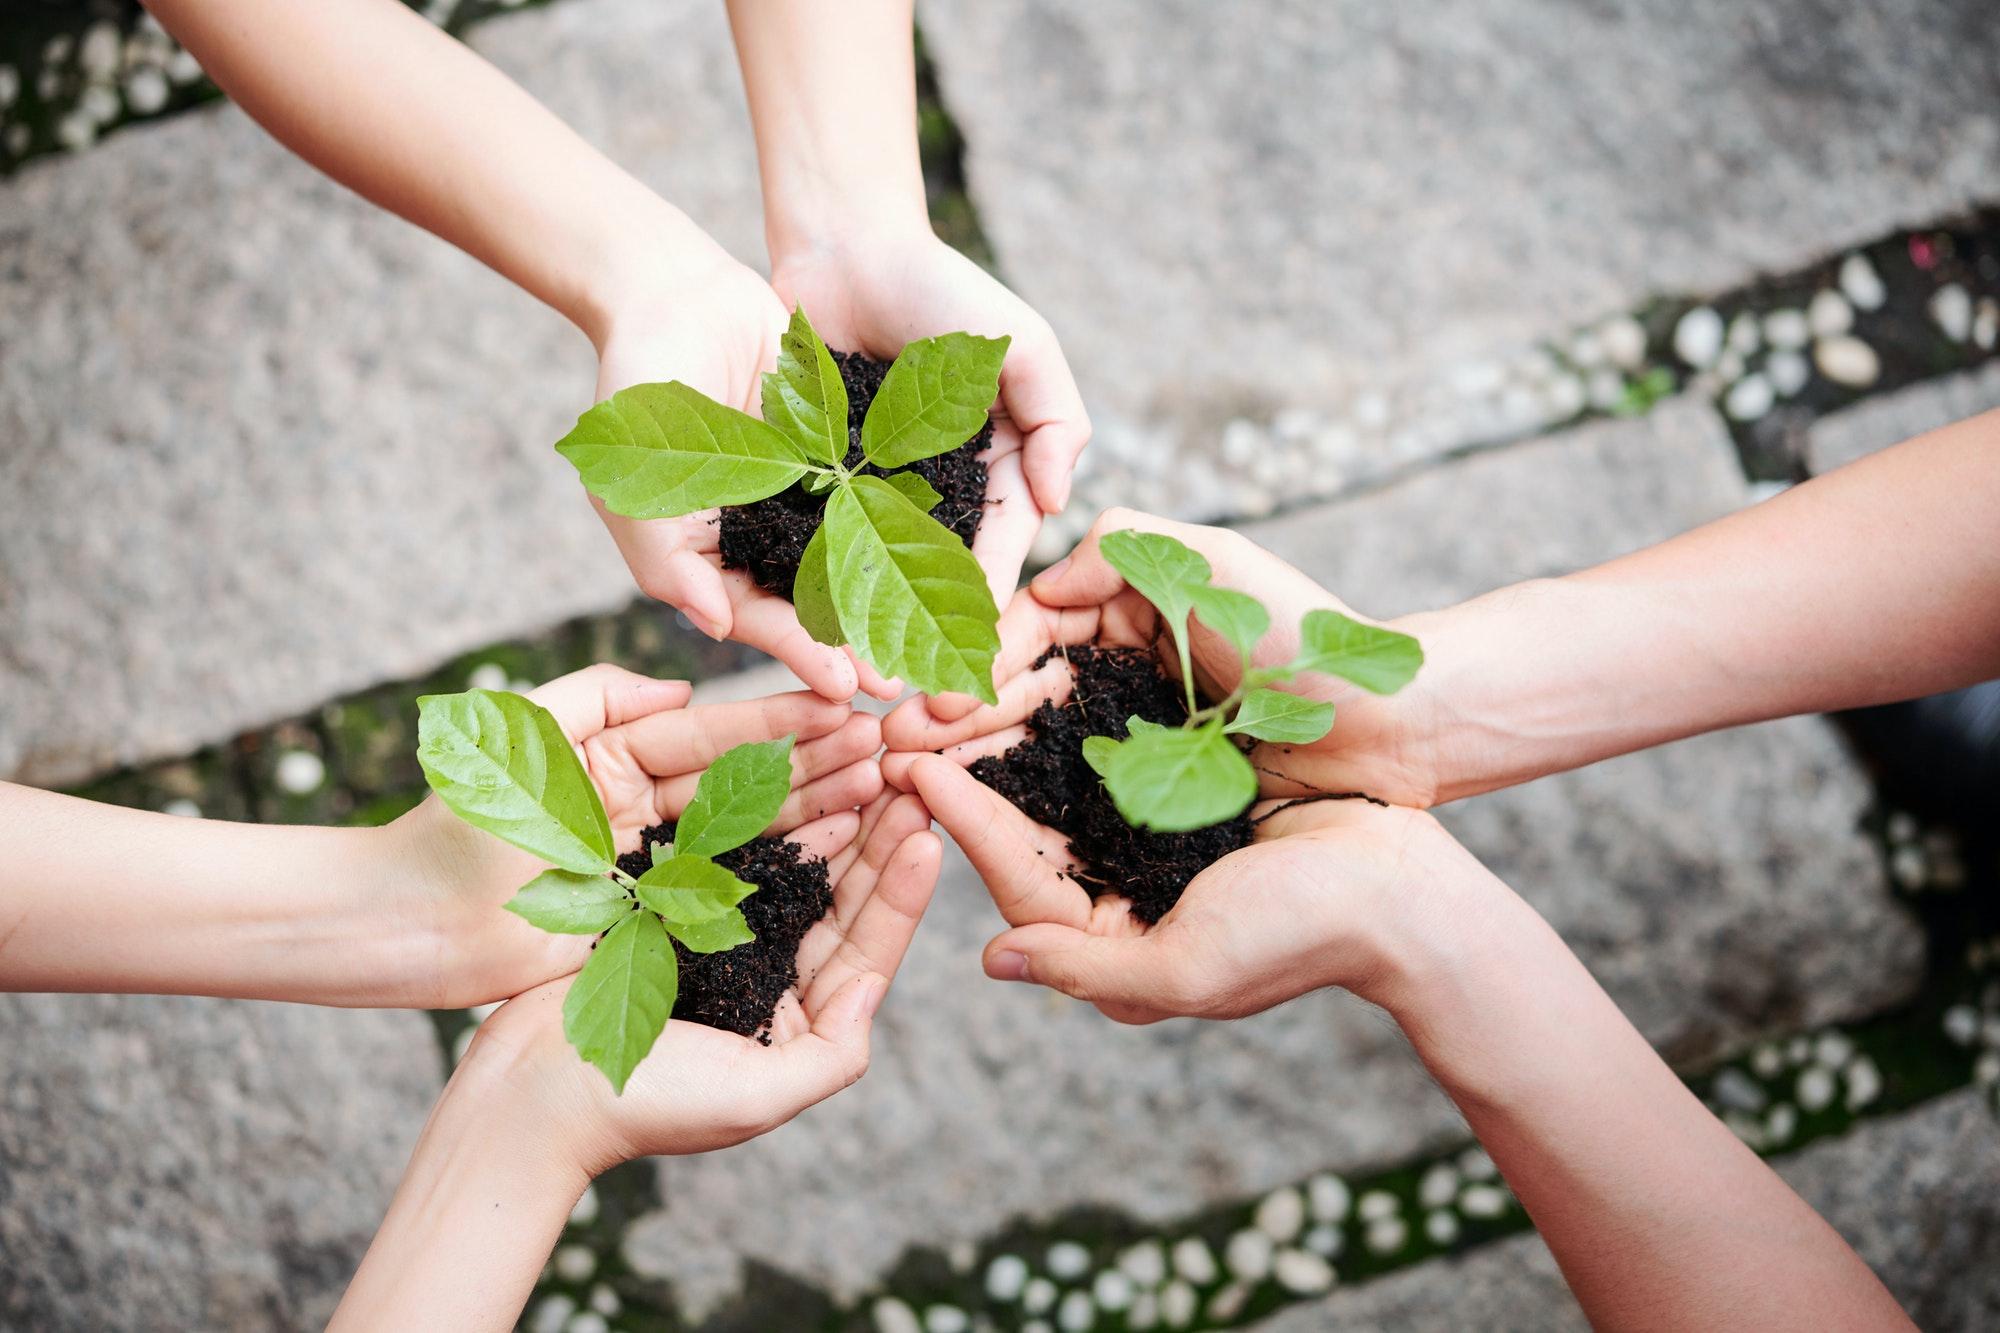 People plant new plants